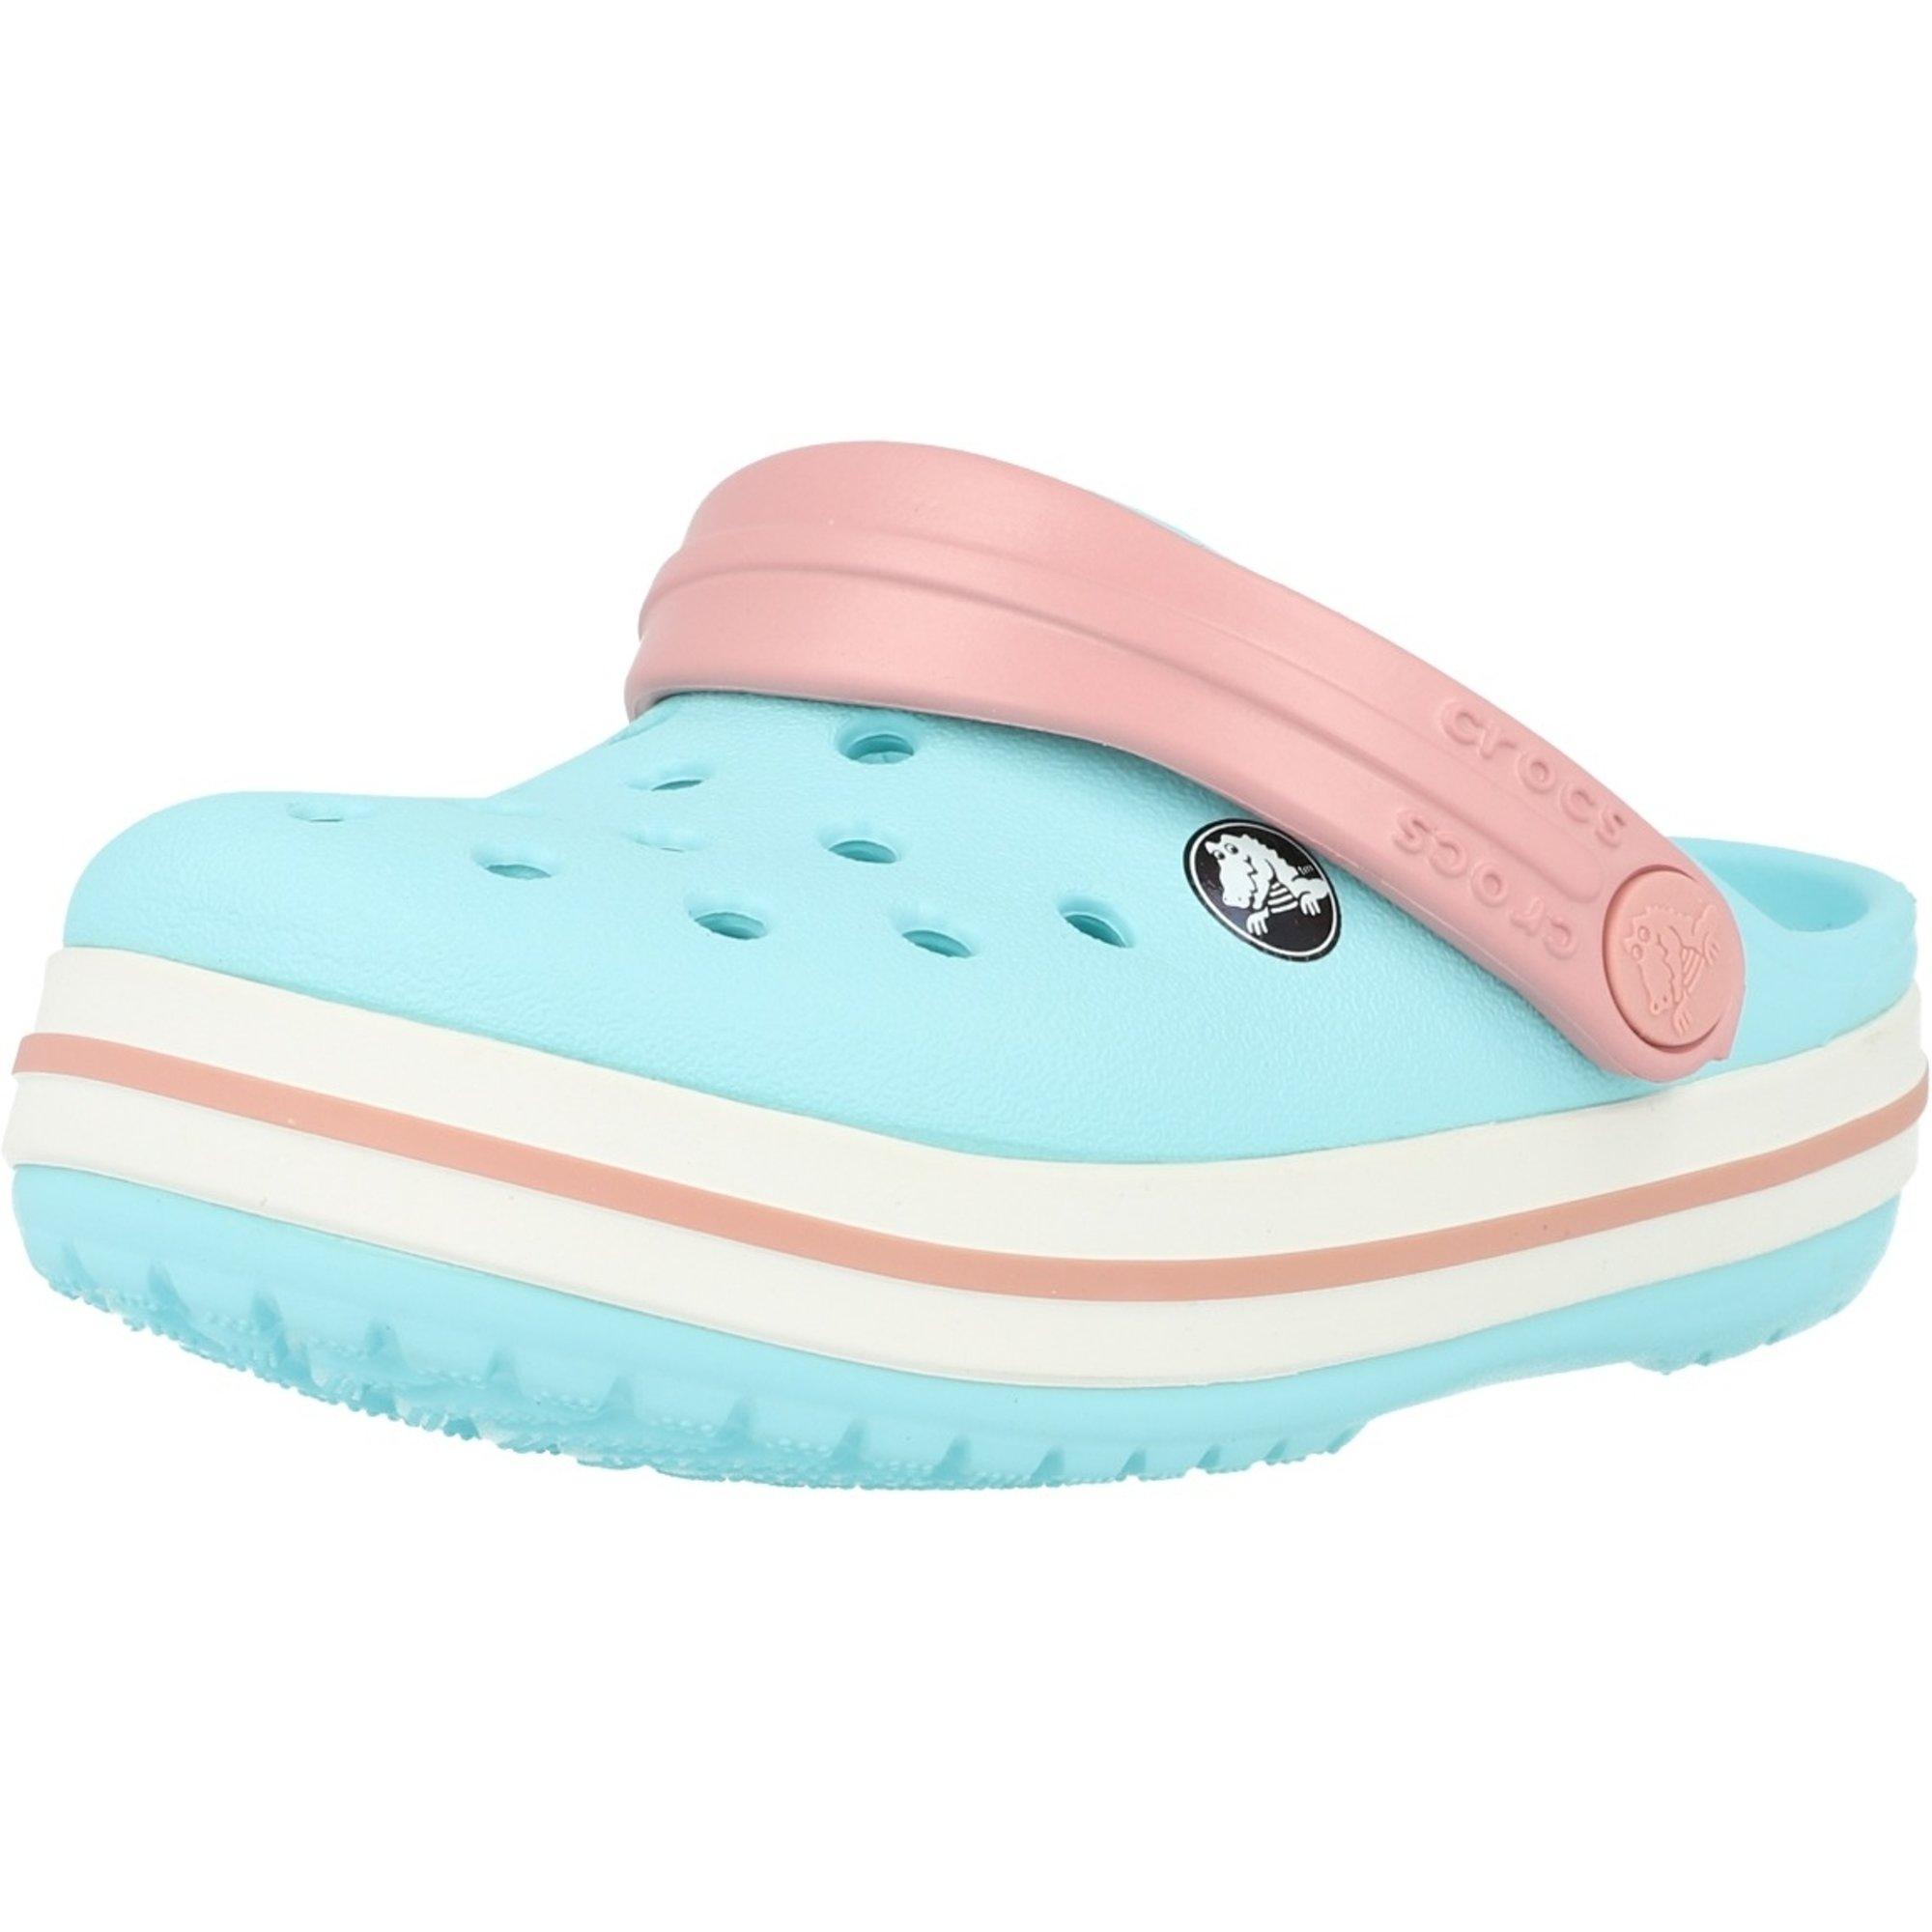 Crocs Kids Crocband Clog Ice Blue/White